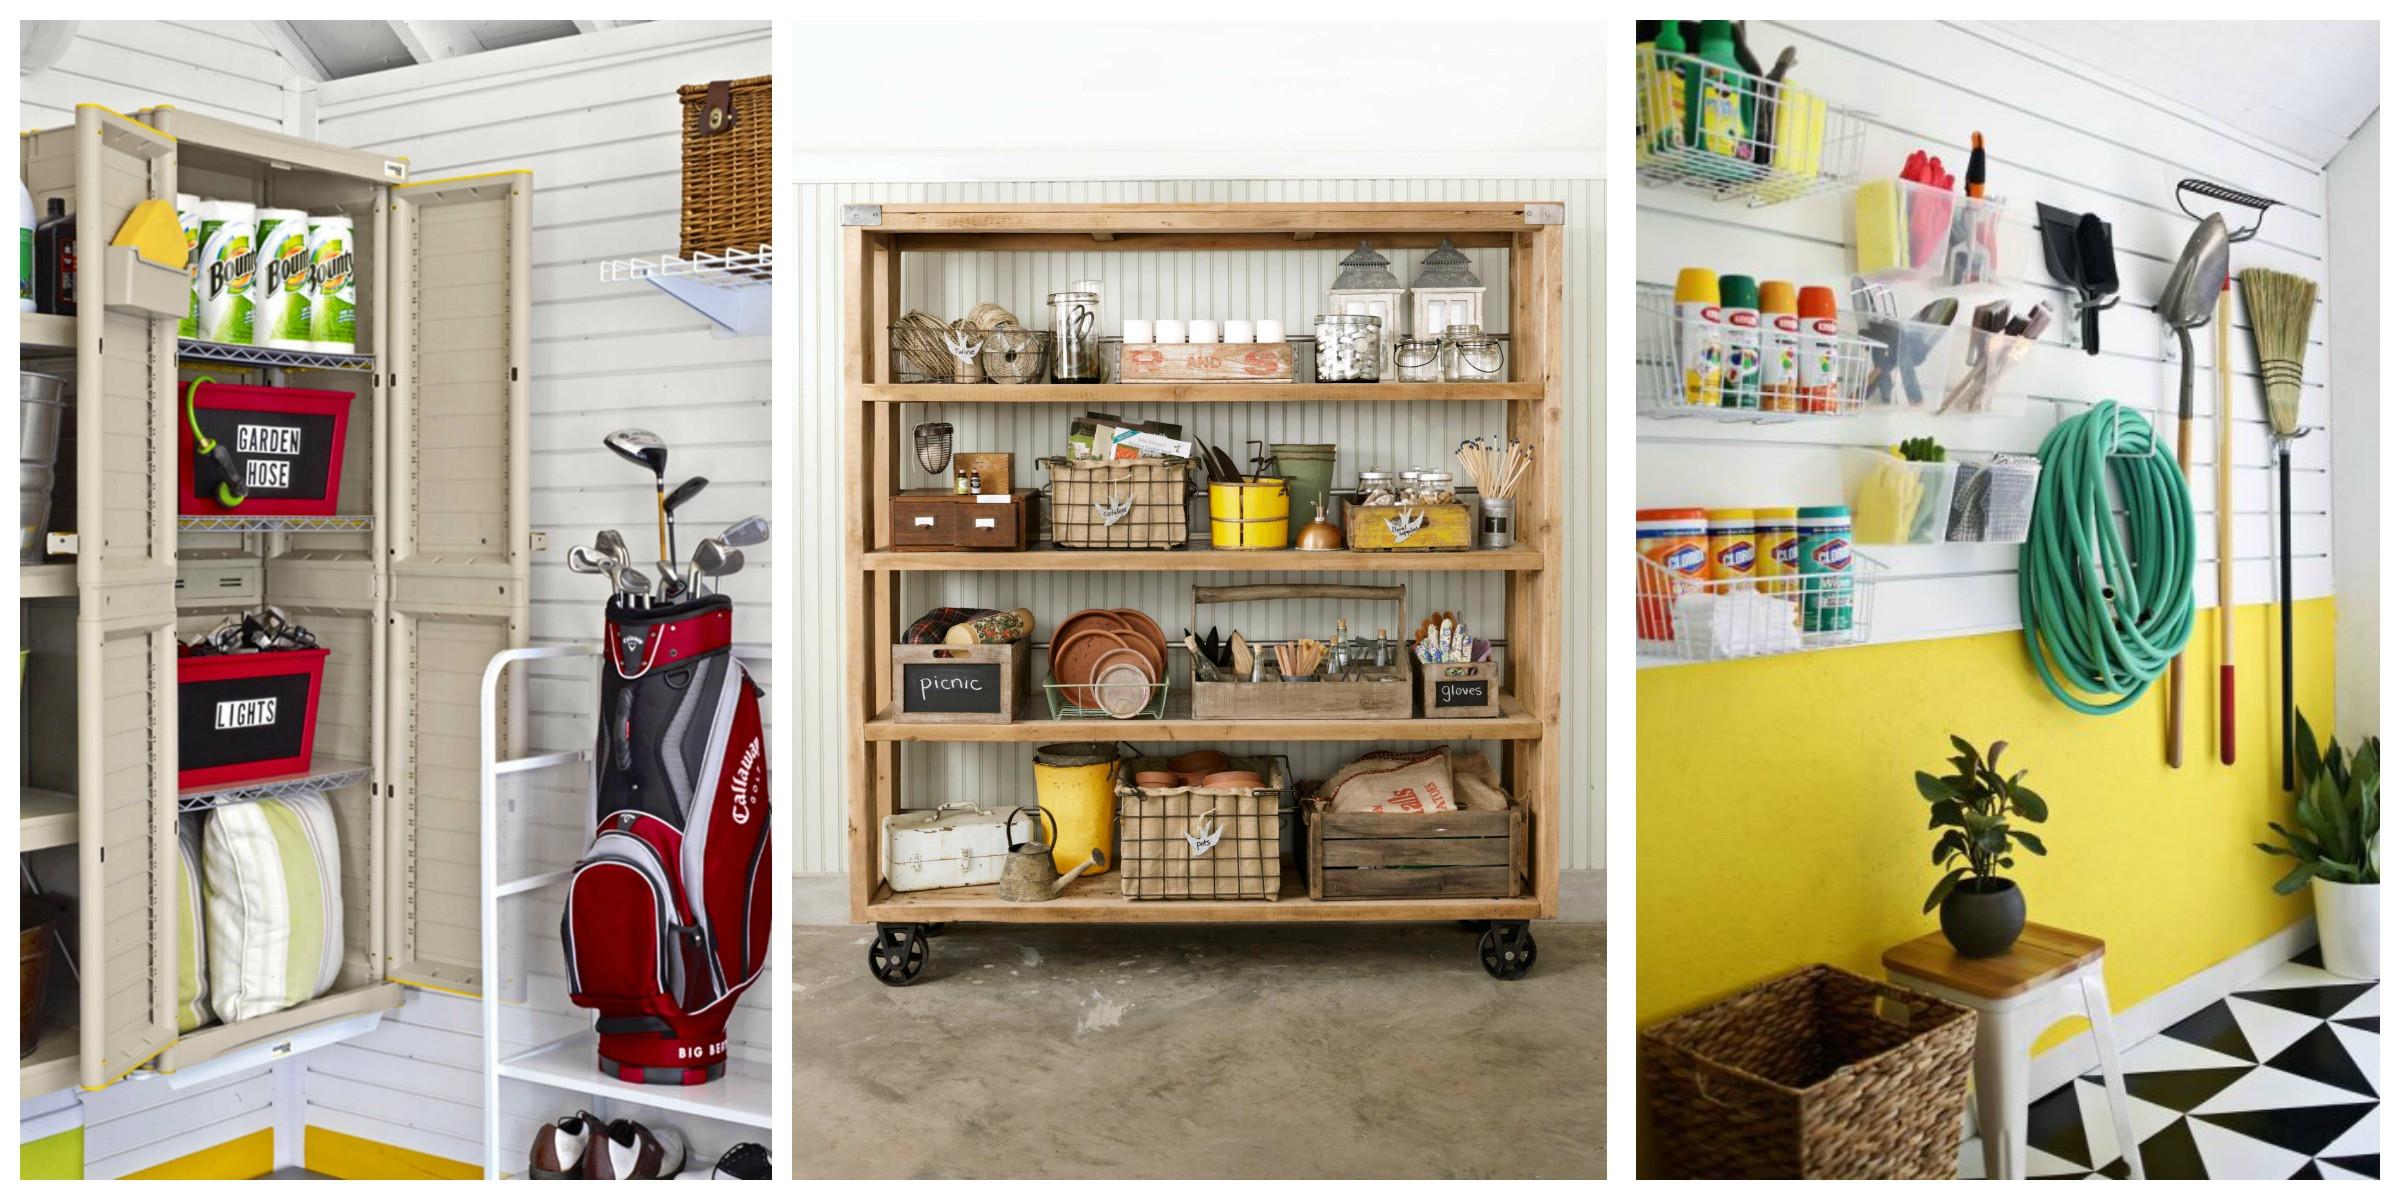 Small Garage Organizing Ideas  14 of the Best Garage Organization Ideas on Pinterest